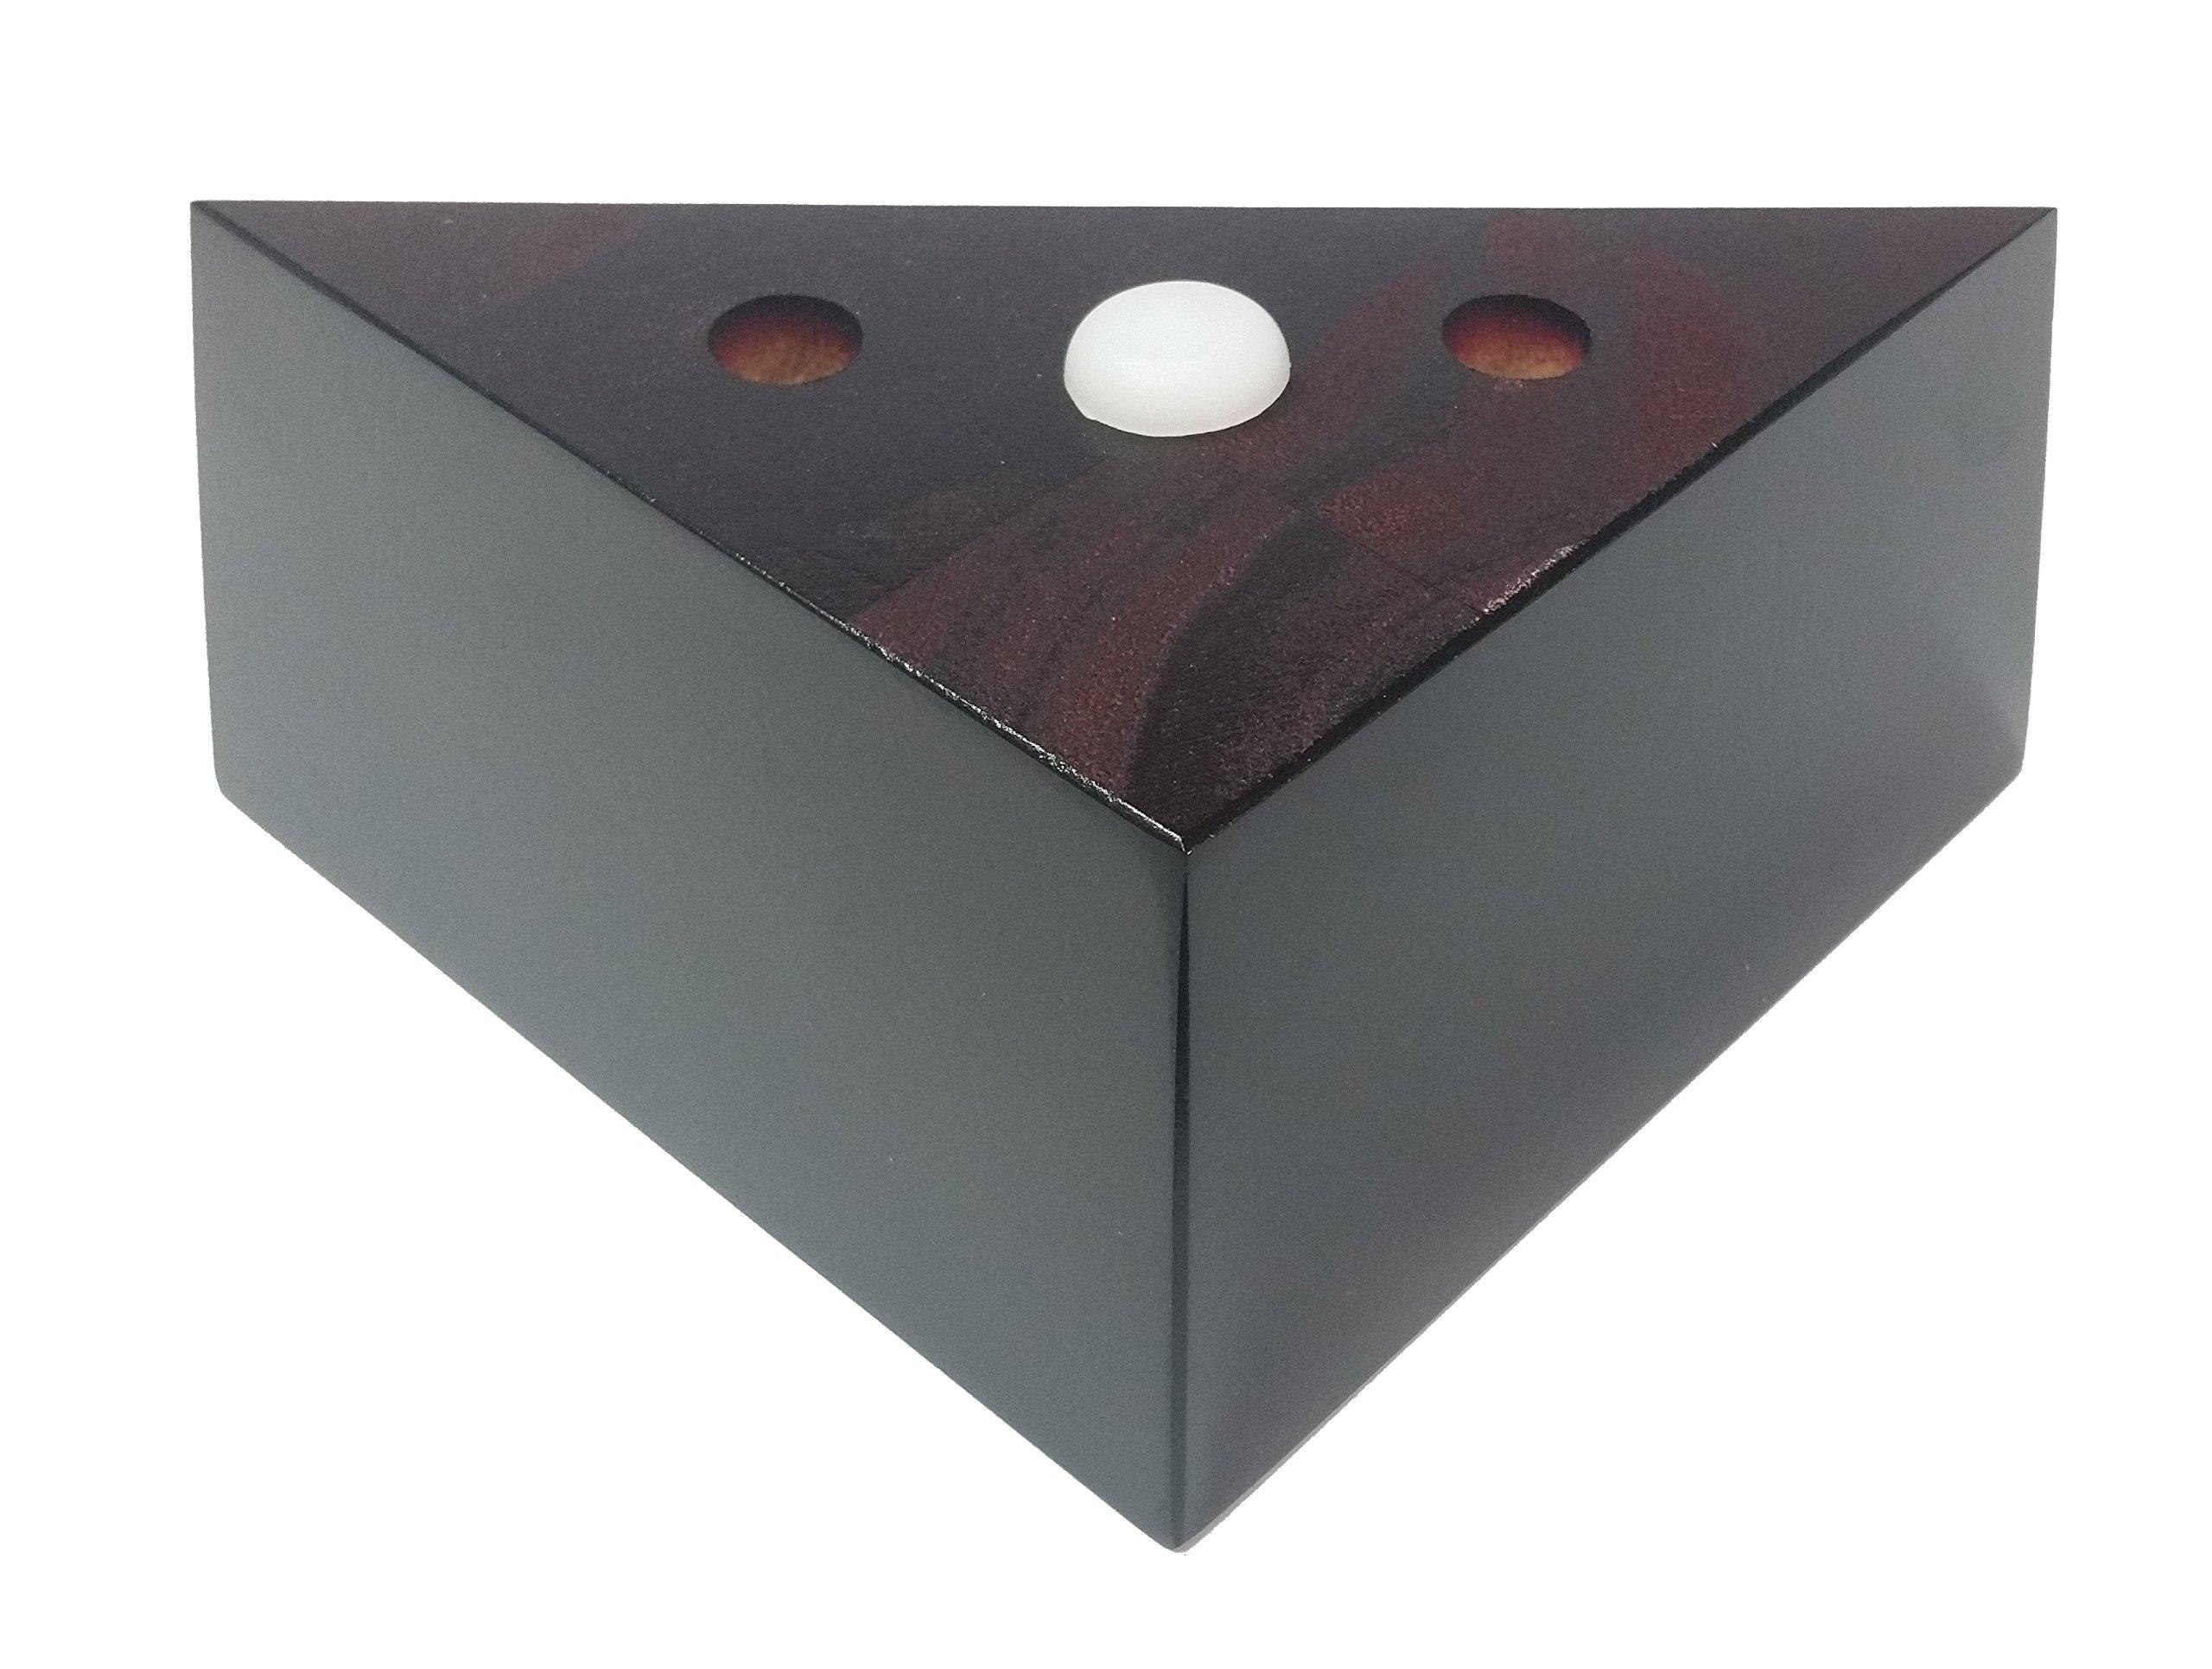 2 1/2'' Espresso Tapered Triangle Sofa Chair Ottoman Furniture Wood Legs - Set of 4